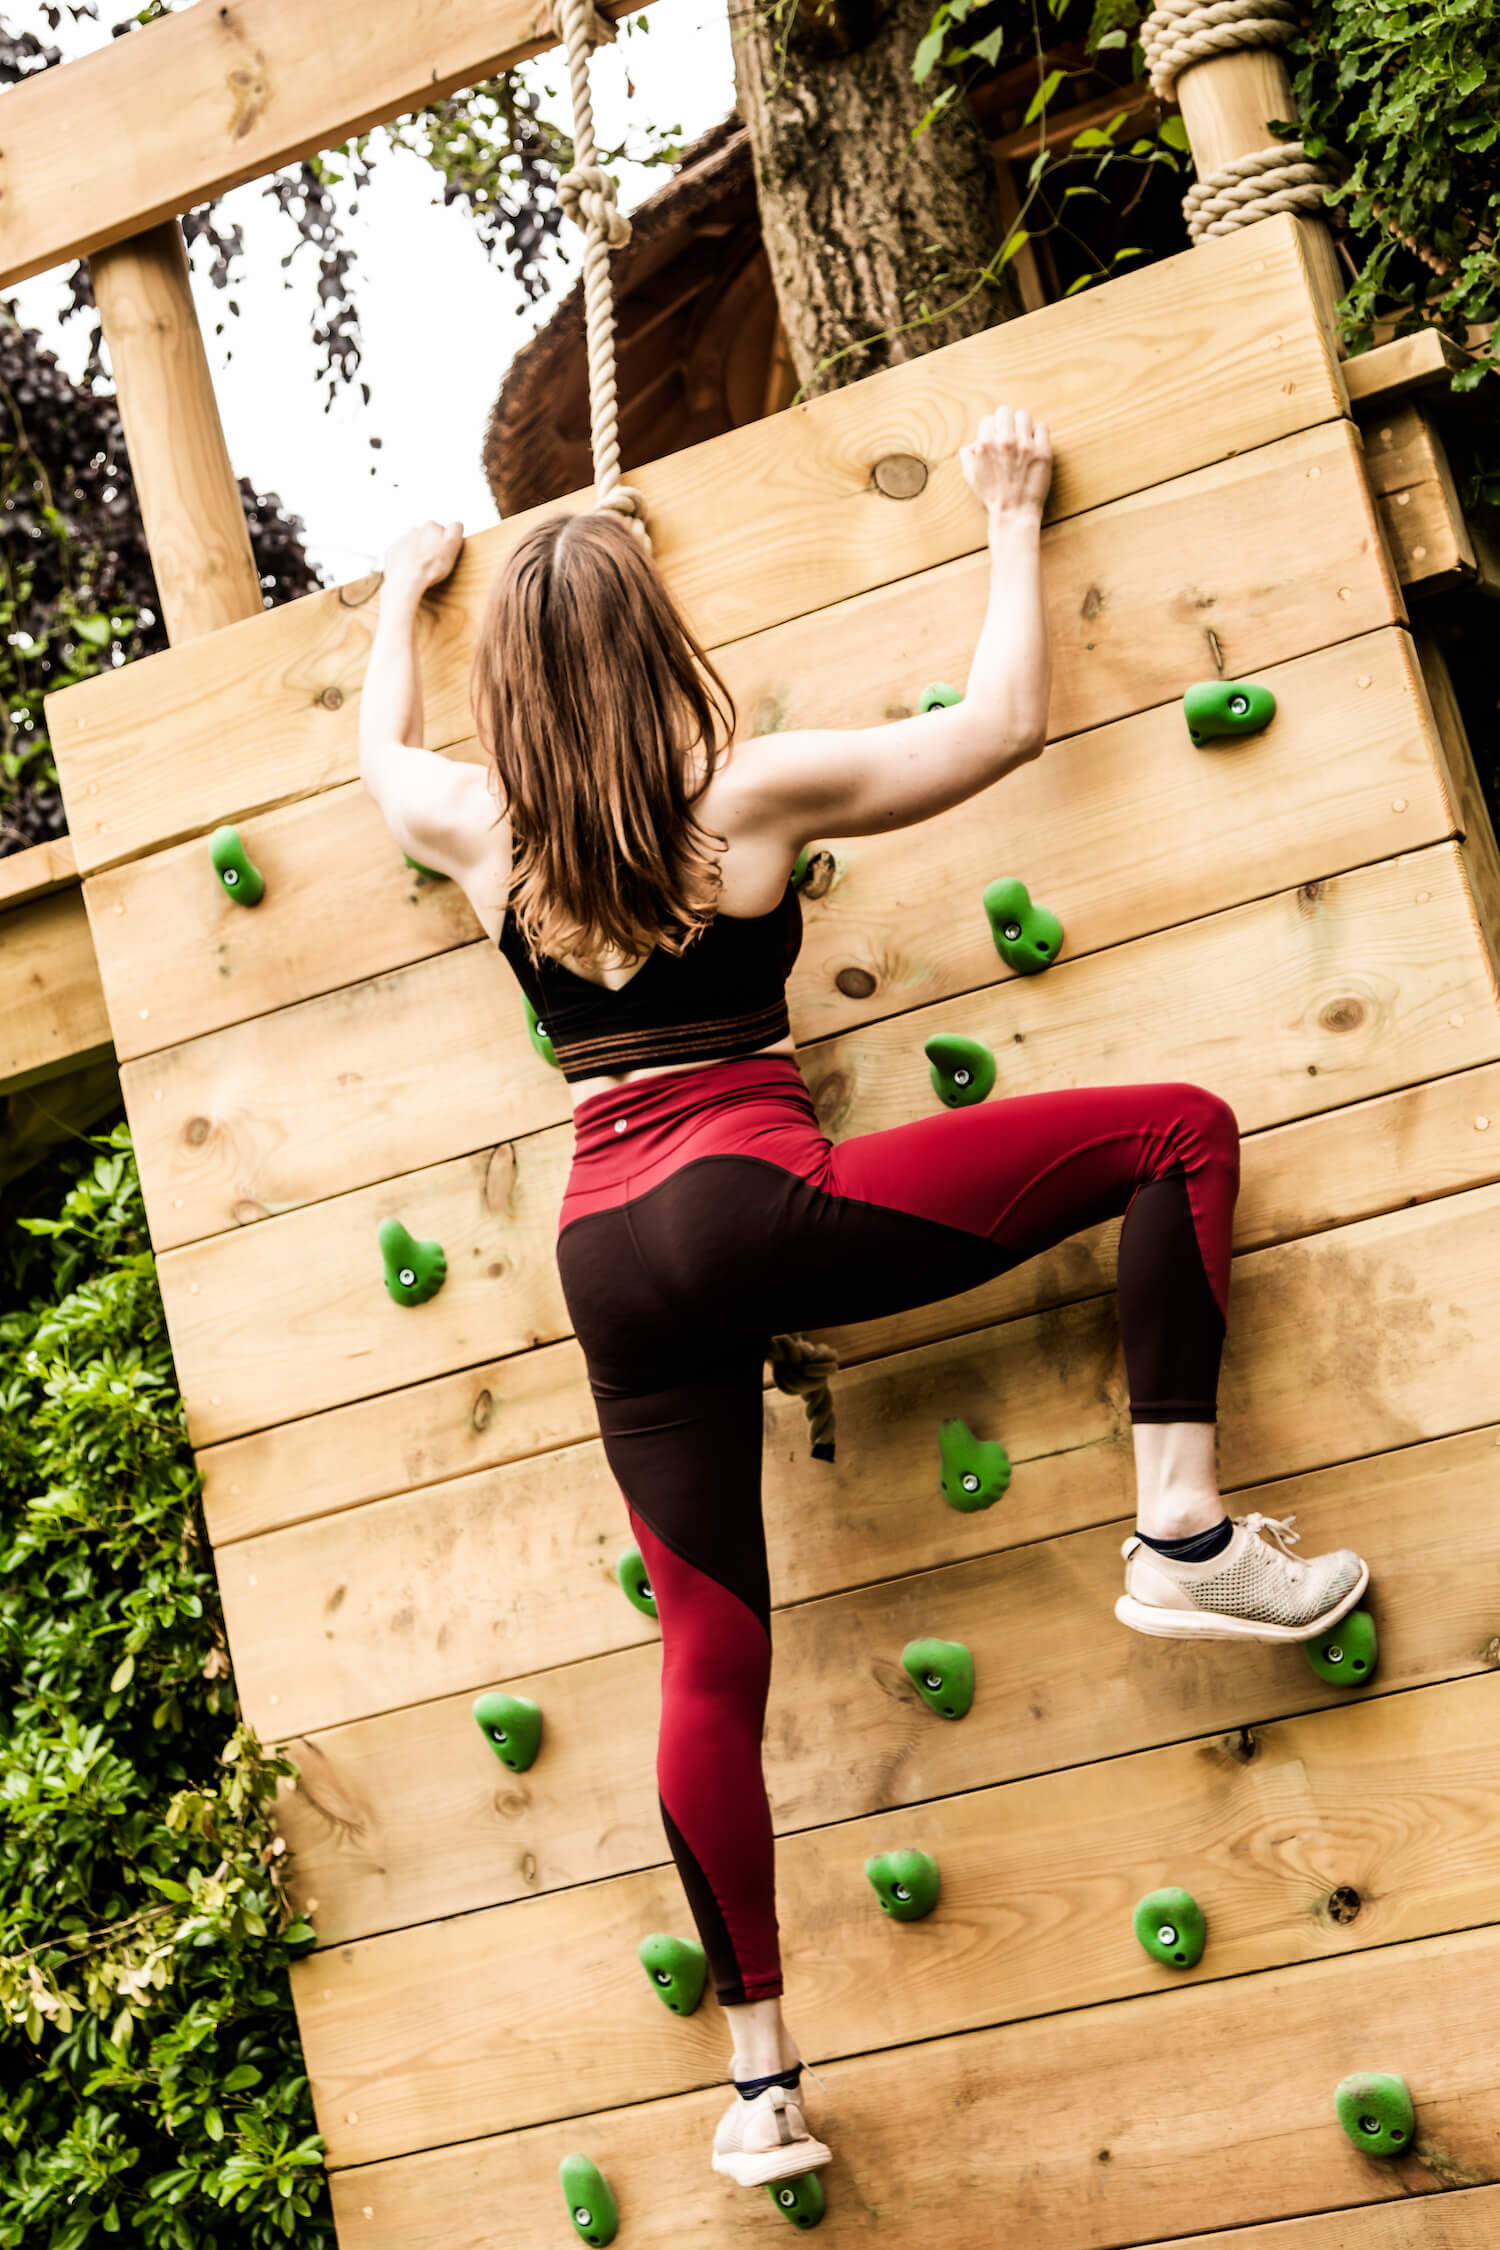 Woman on Climbing Wall.jpg